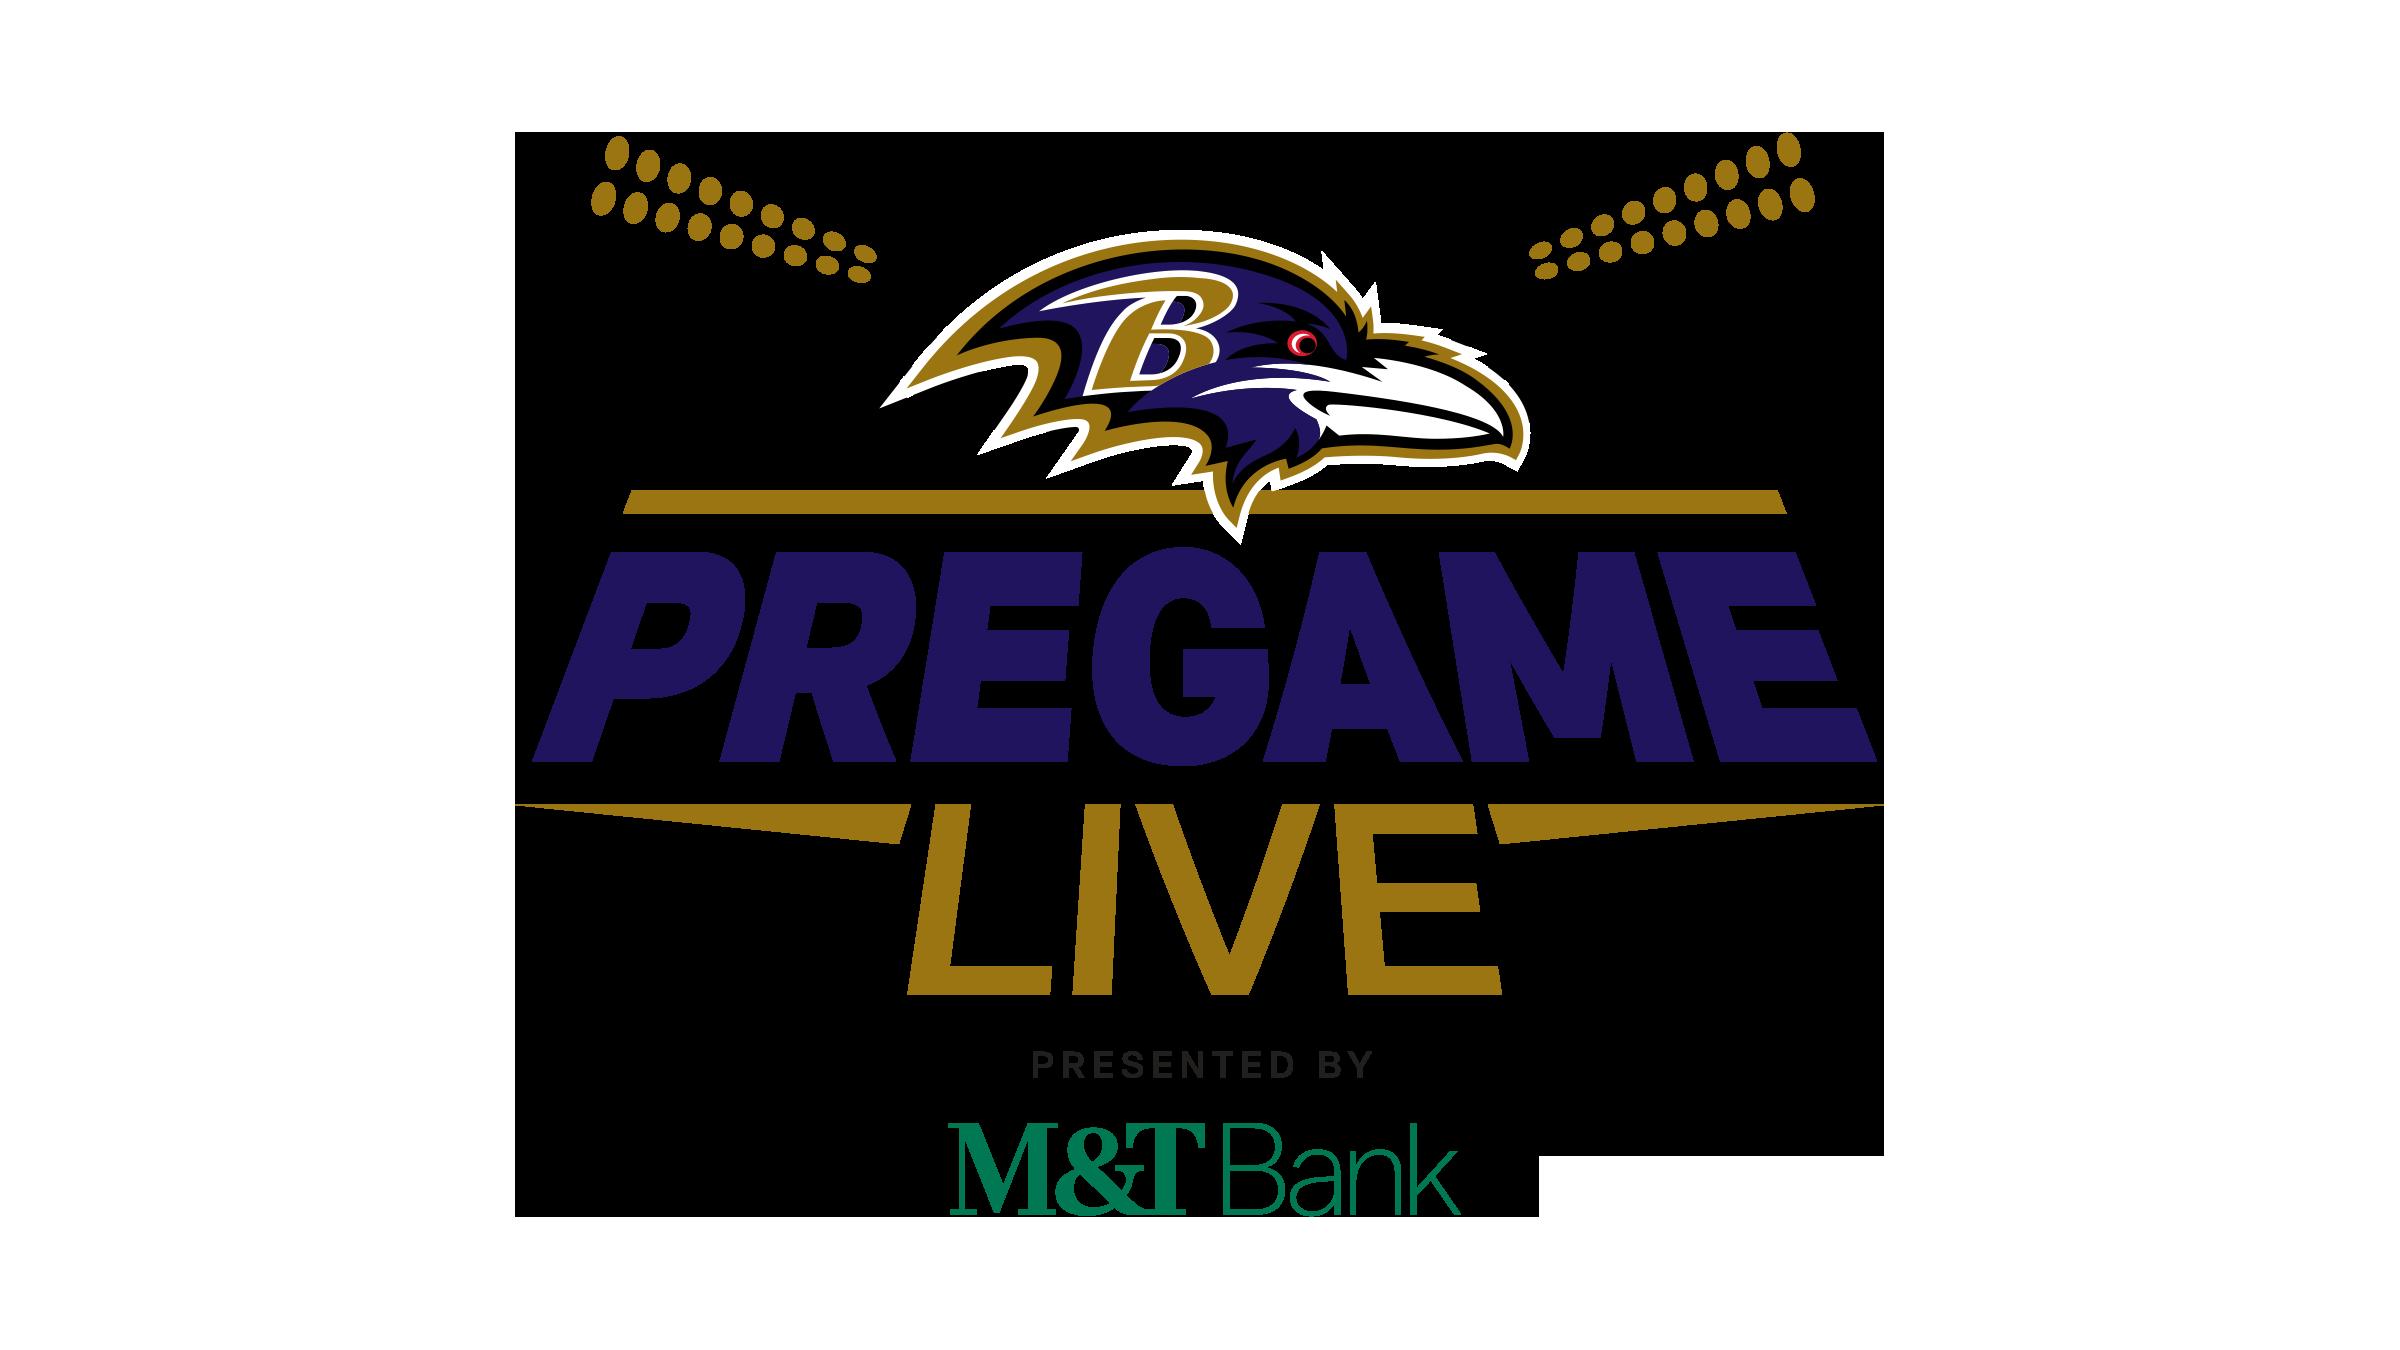 Ravens Pregame Live